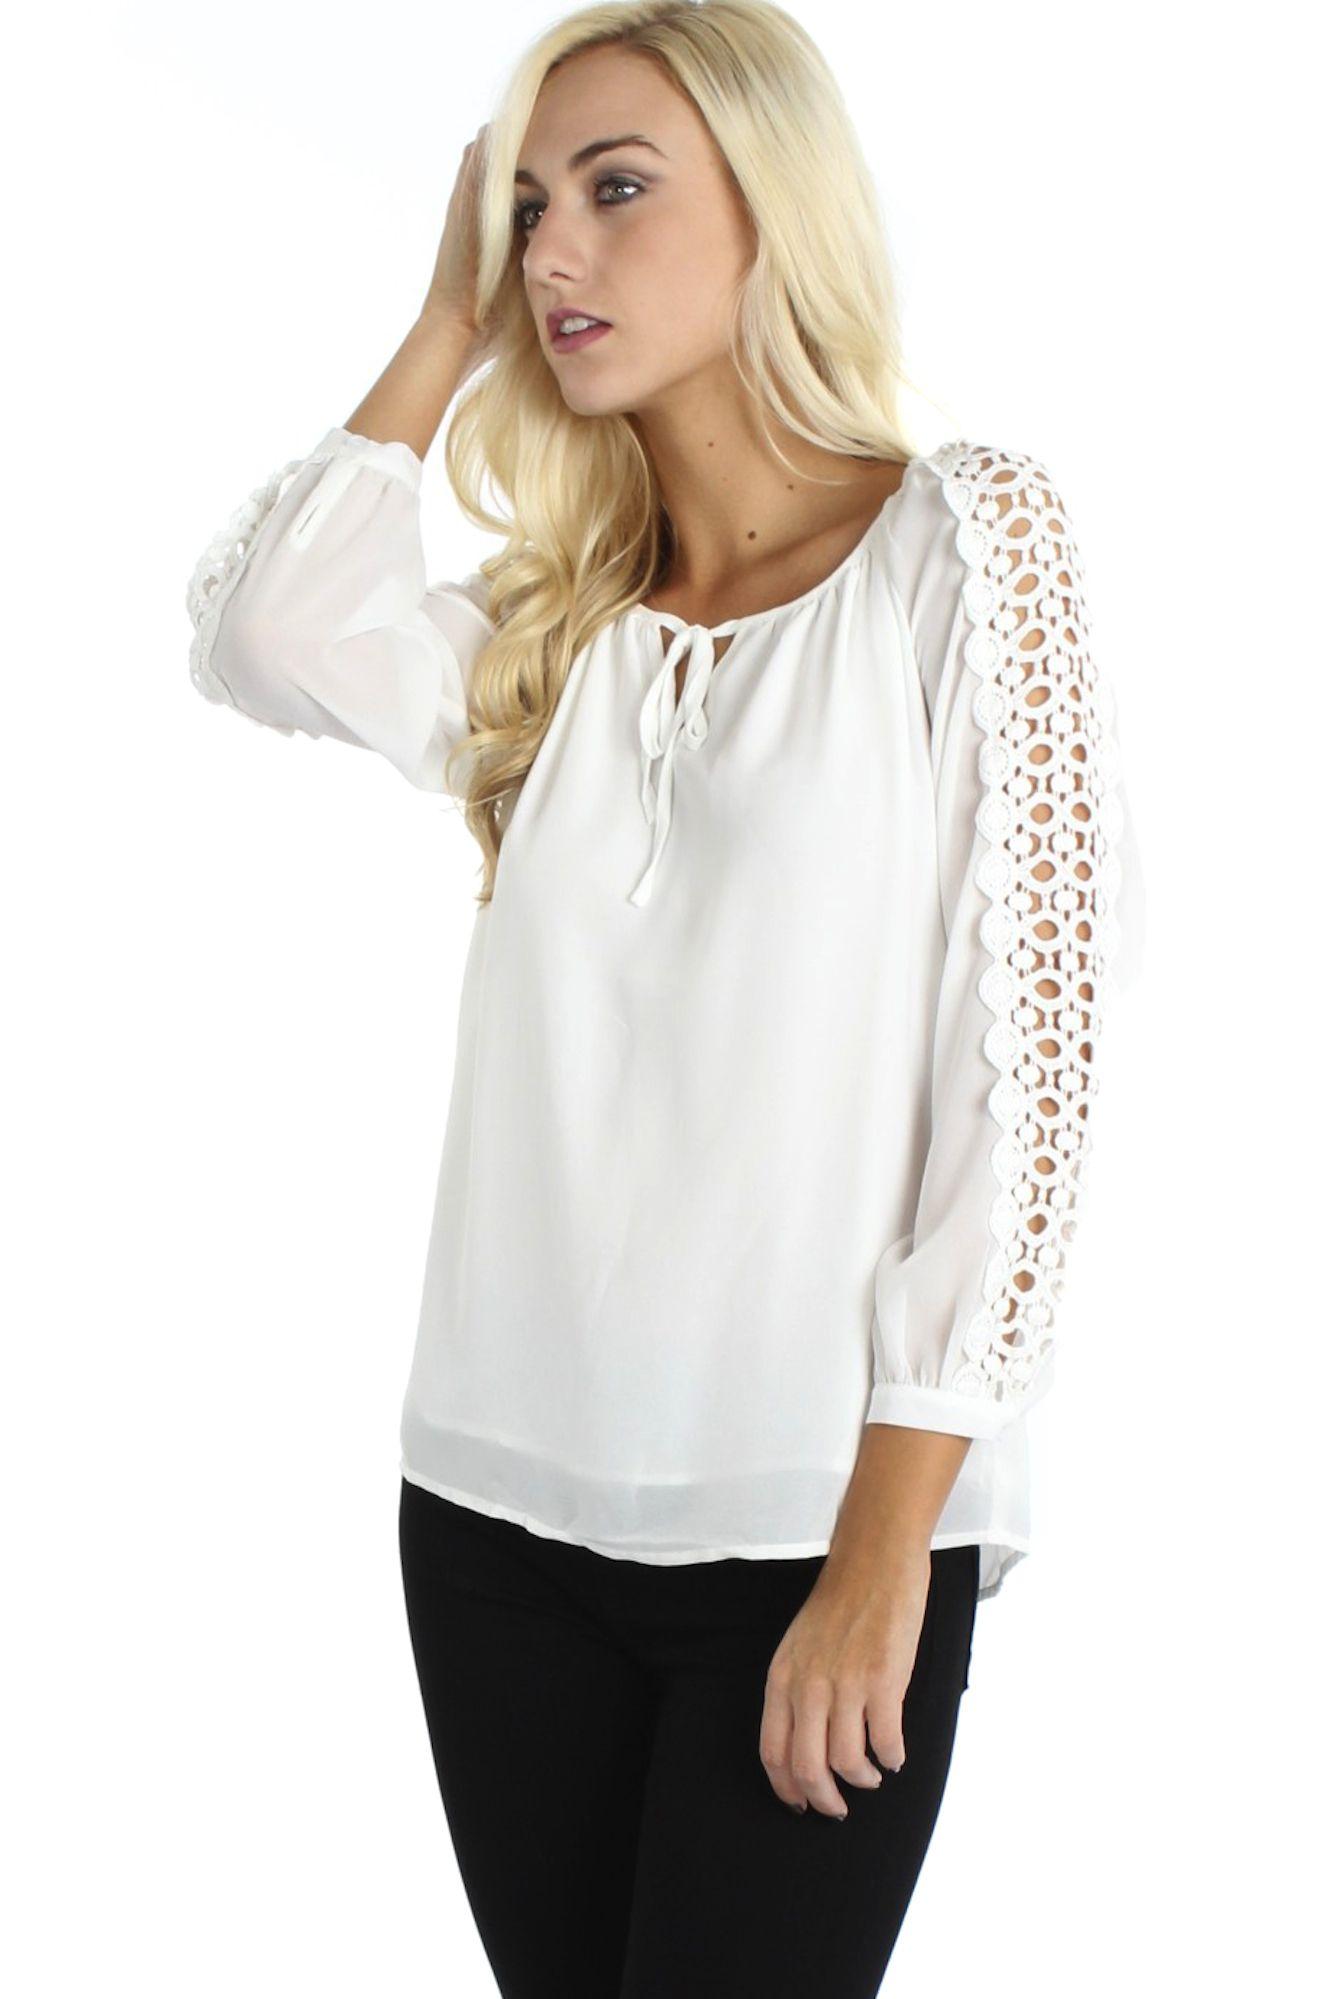 Crochet Sleeve Blouse $34.99 #sophieandtrey #tops #blouses #longsleeves #crochet #opencrochet #white